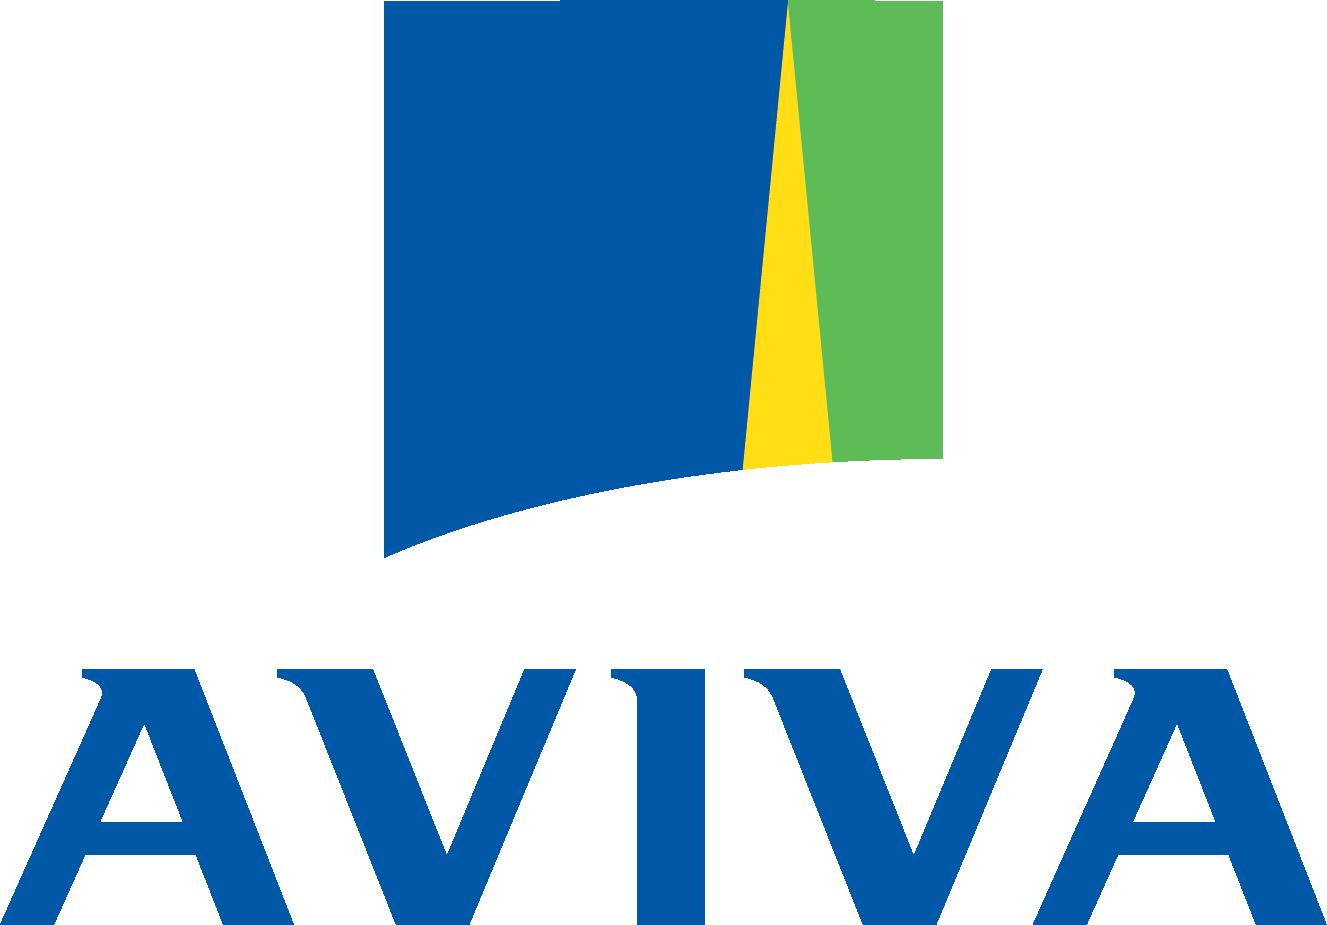 Partner_Logos/Aviva.png